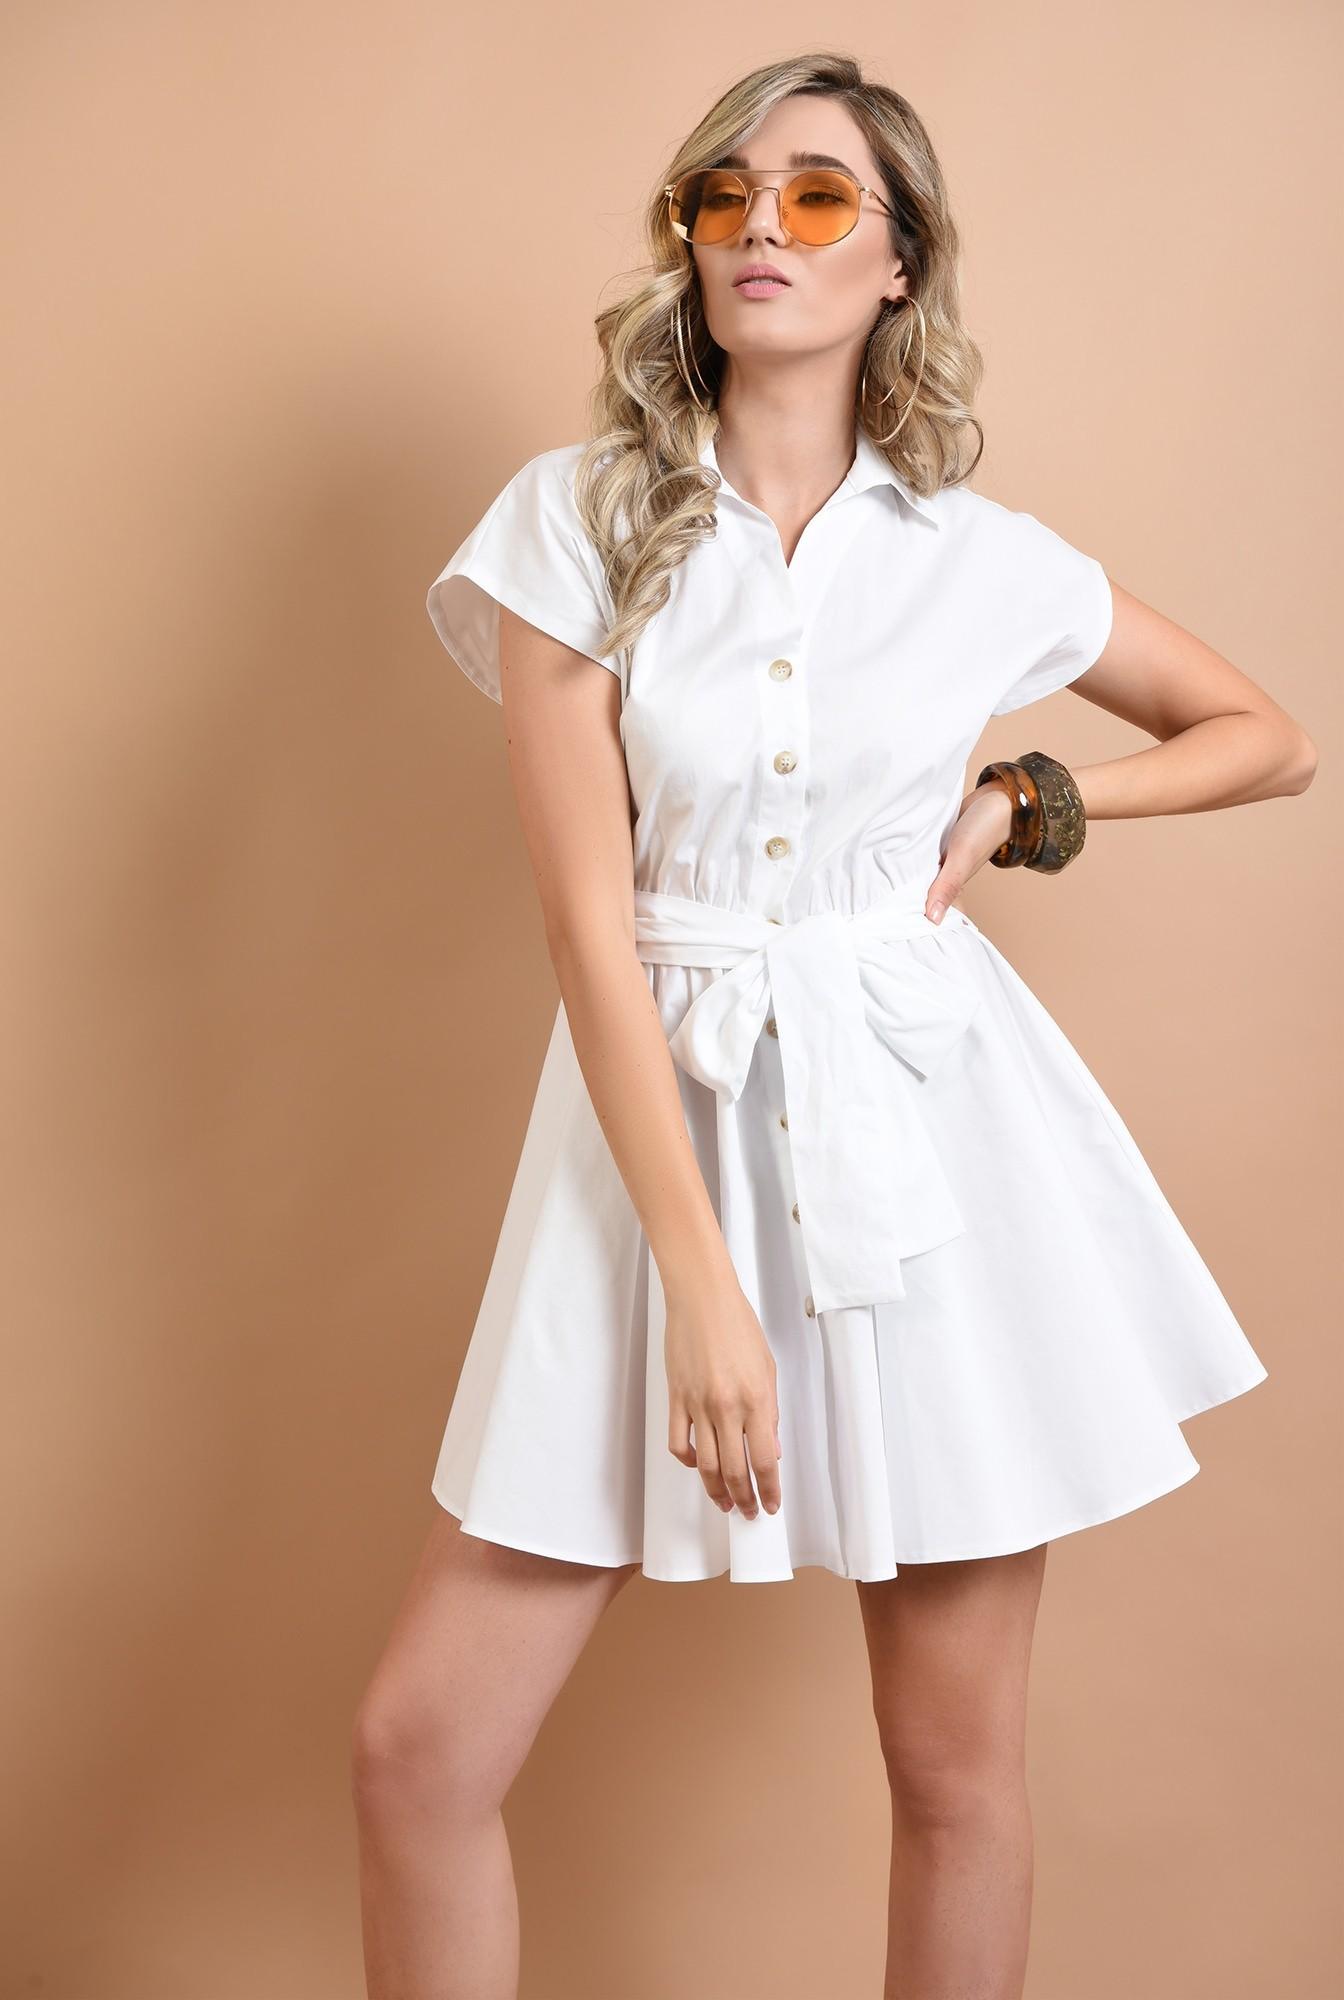 0 - 360 - rochie mini, evazata, fara maneci, cu cordon, alba